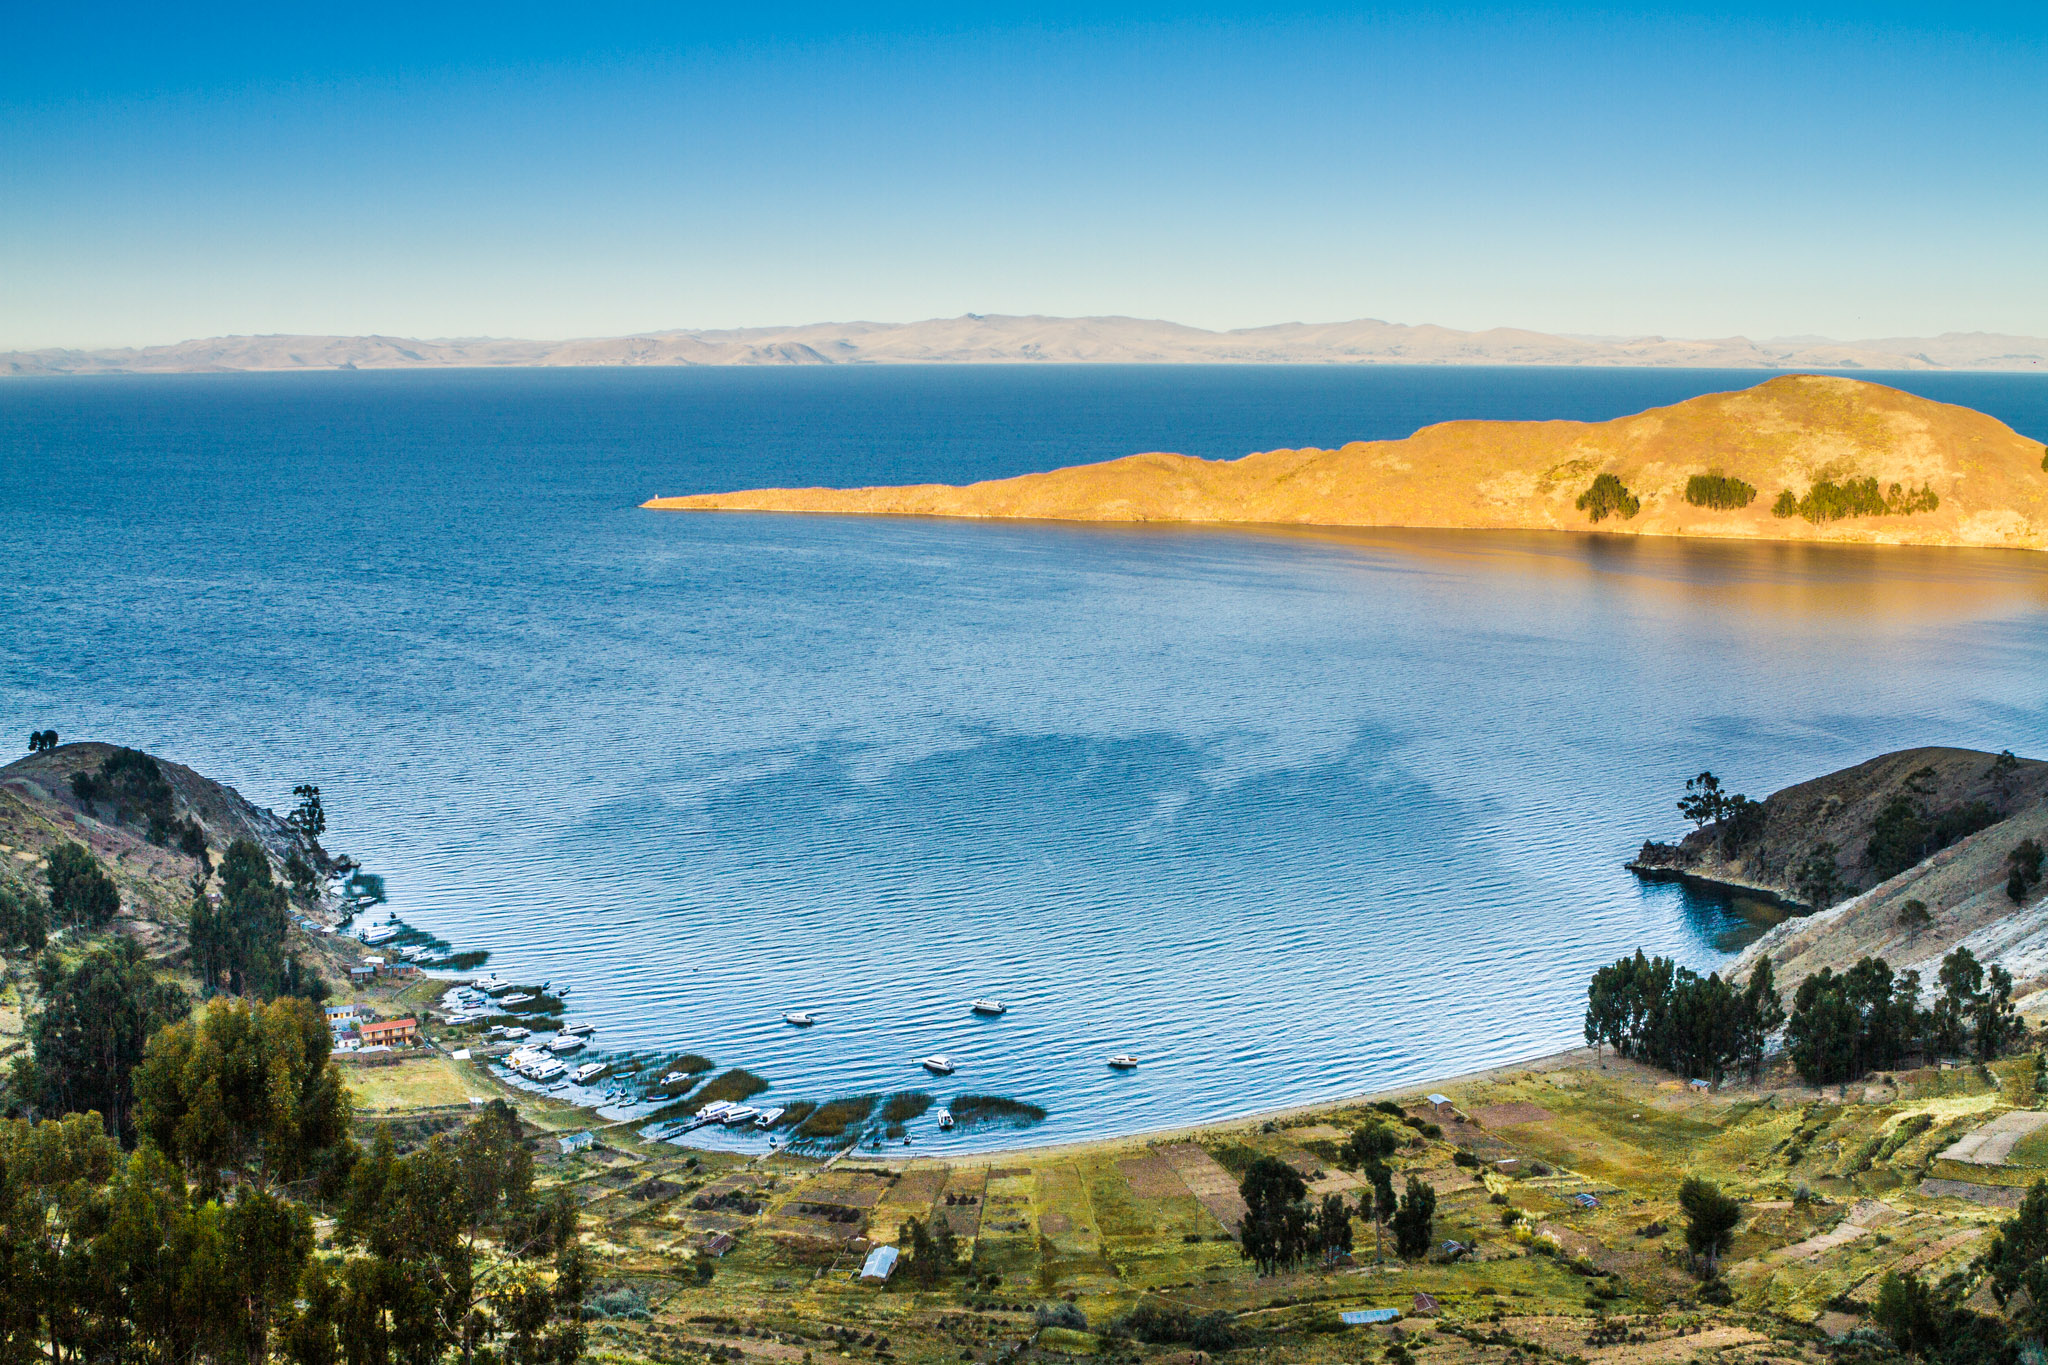 Ali-Barqawi-Studios-Explore-Series-Travel-Adventure-Documentary-C4CGAZA-Bolivia-Lake-Titicaca-2015-047.jpg